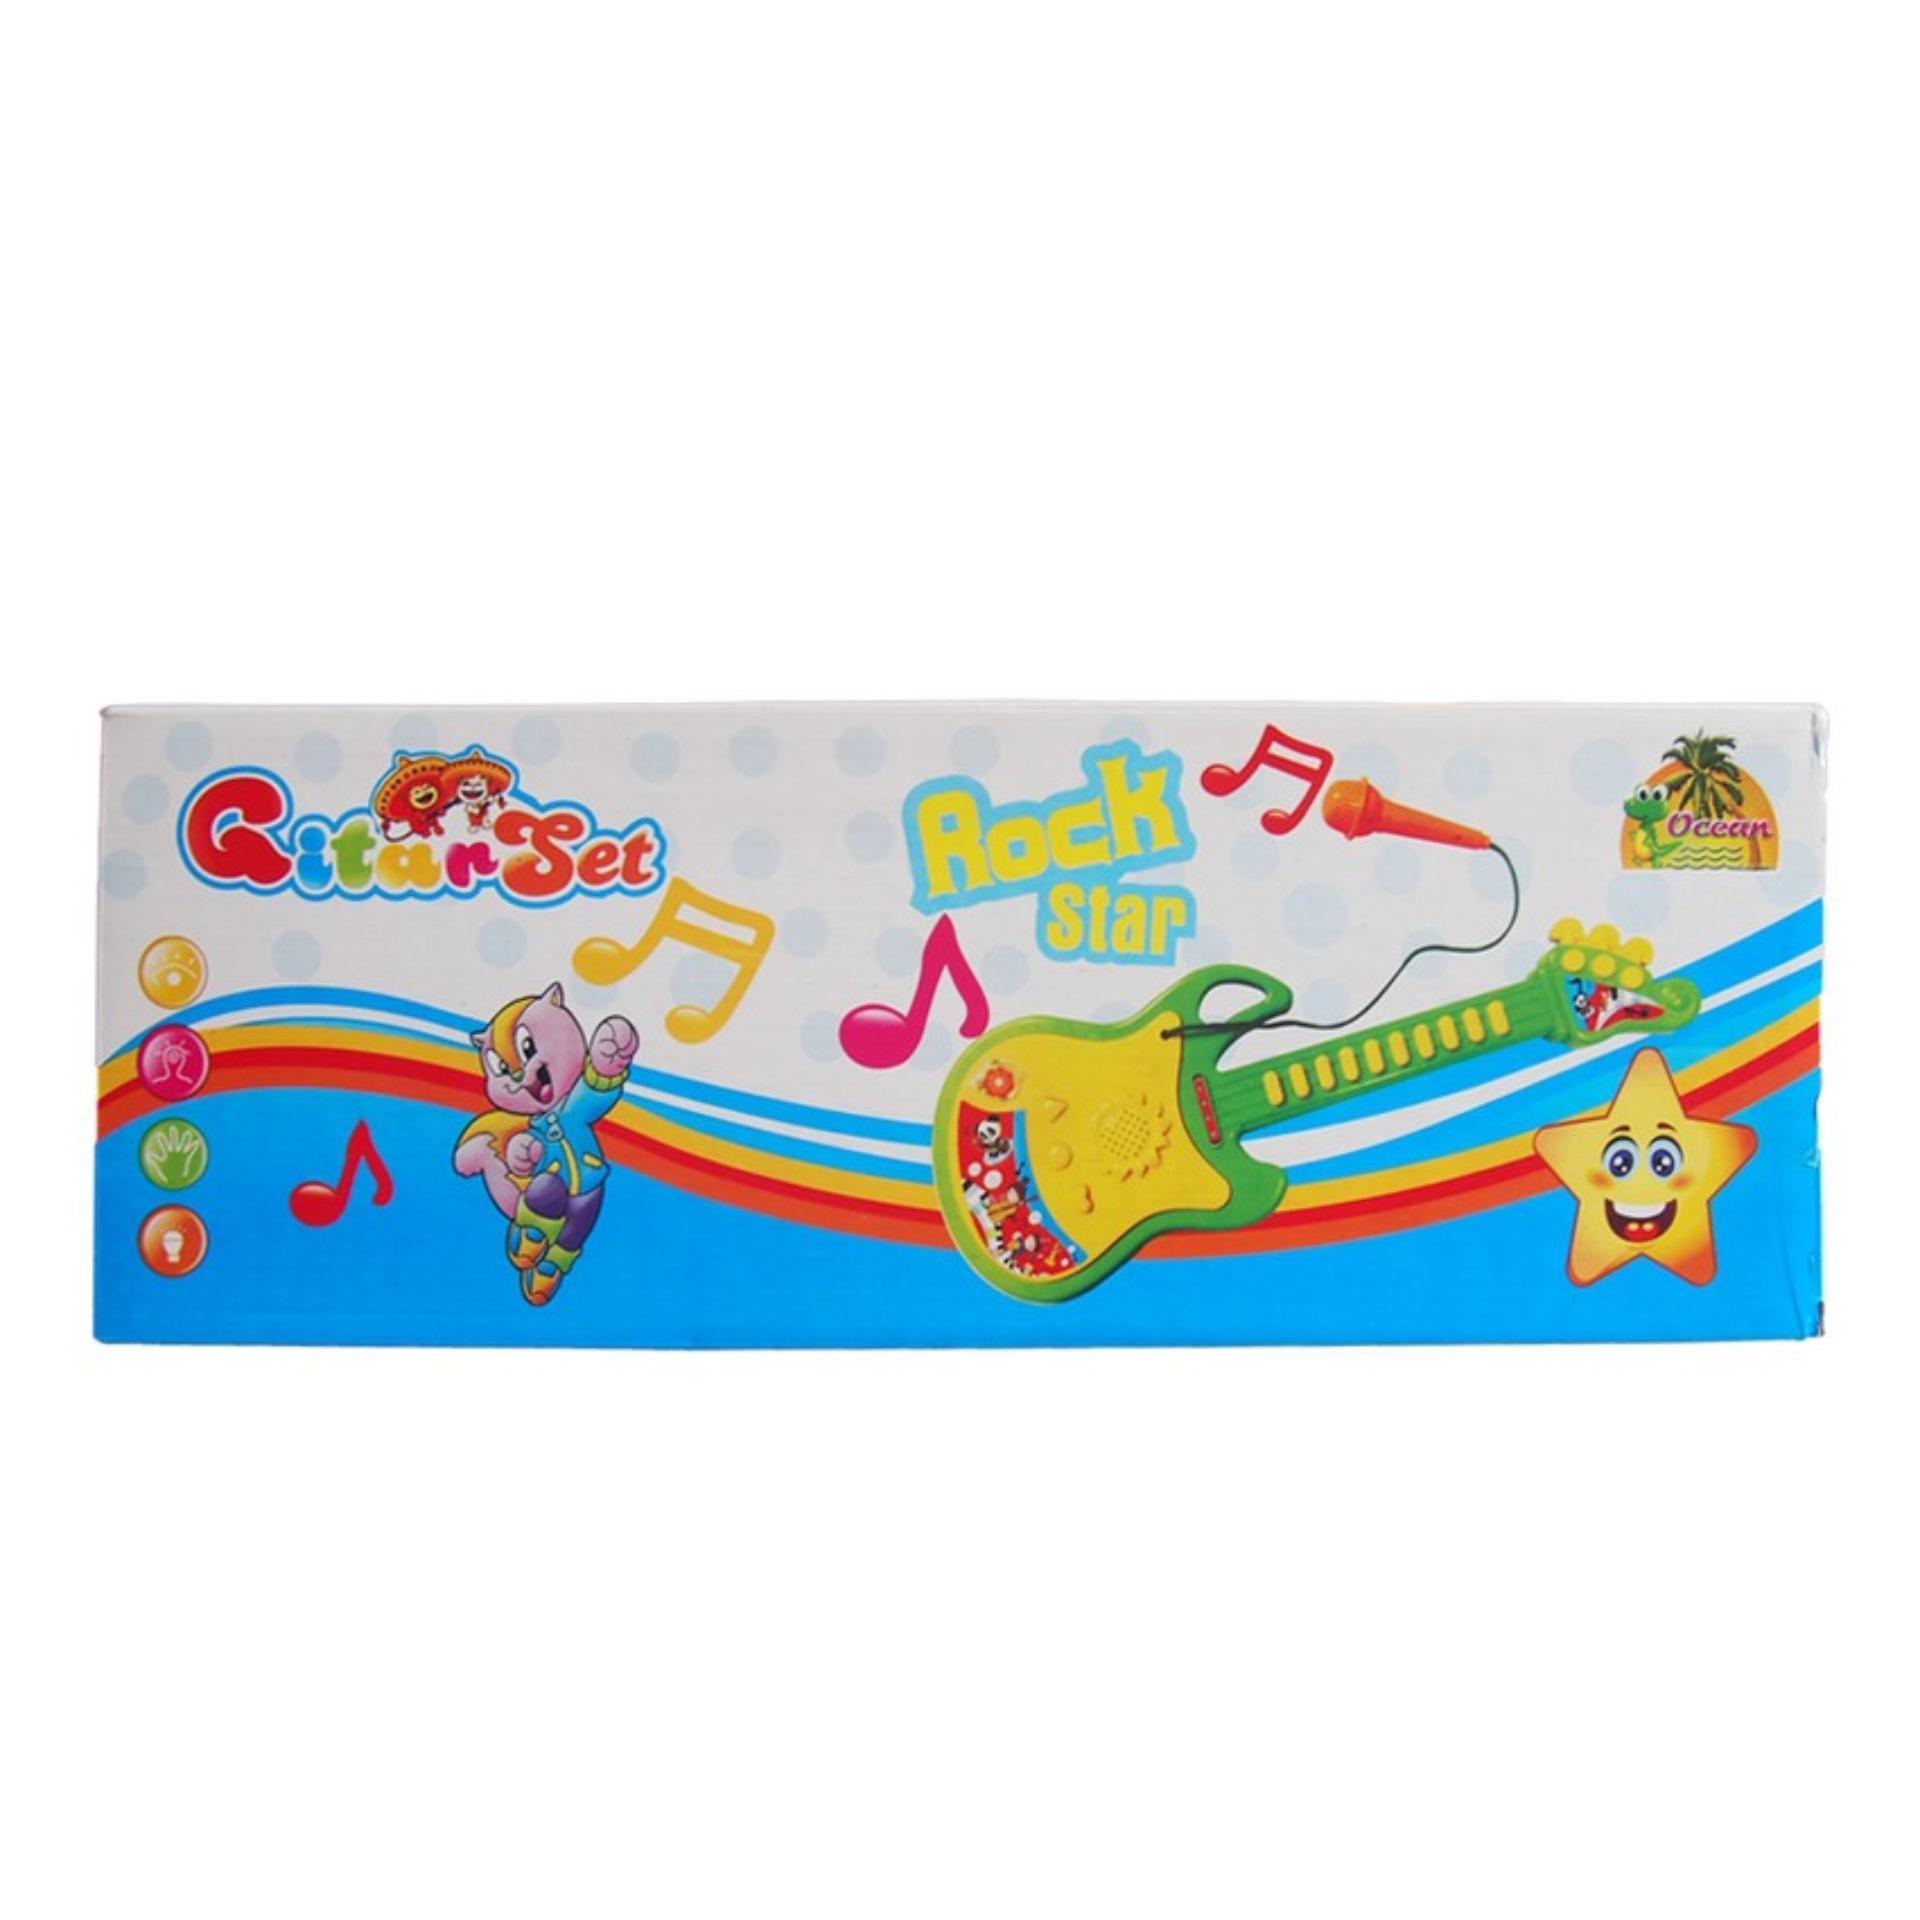 Ocean Toy - Gitar Set Rock Star Mainan Edukasi Anak OCT296 - 2